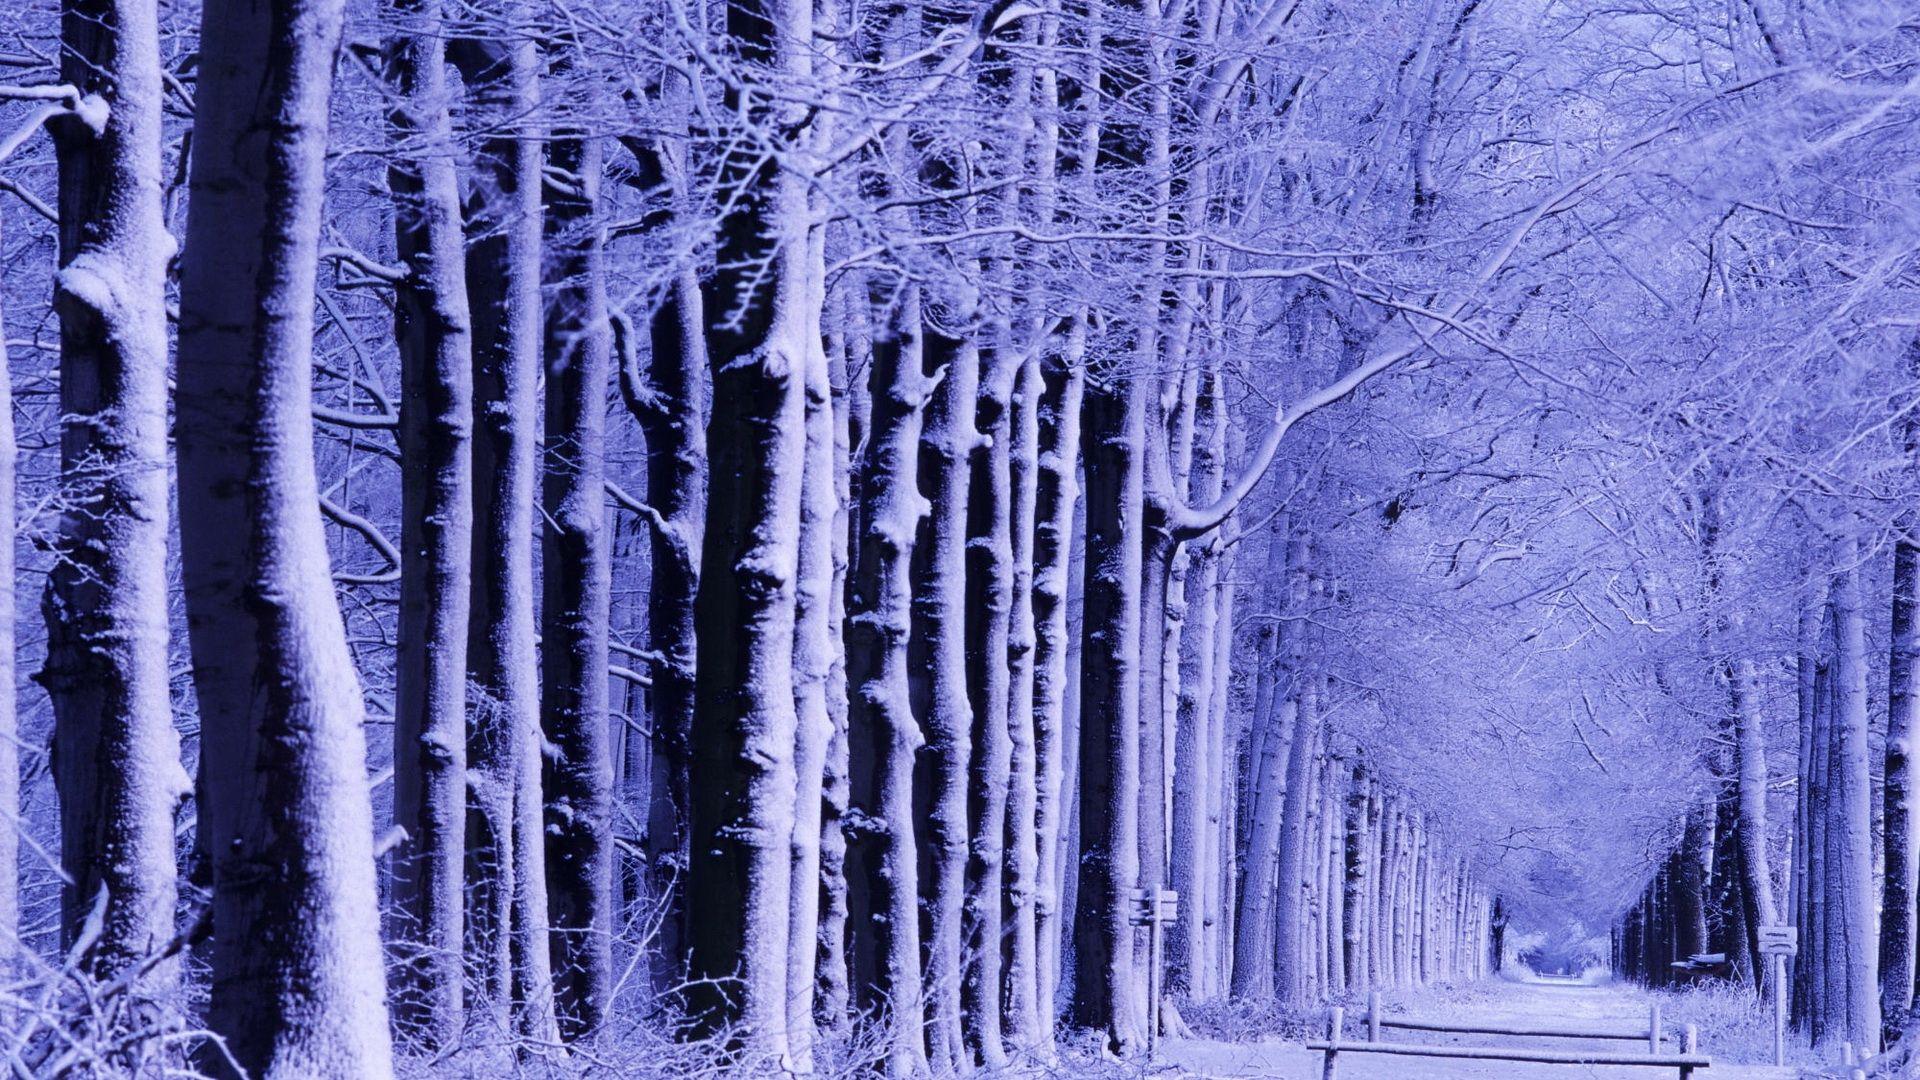 Download Wallpaper 1920x1080 Winter Park Shop Trees Snow Hoarfrost Full Hd 1080p Hd Background Fantasi